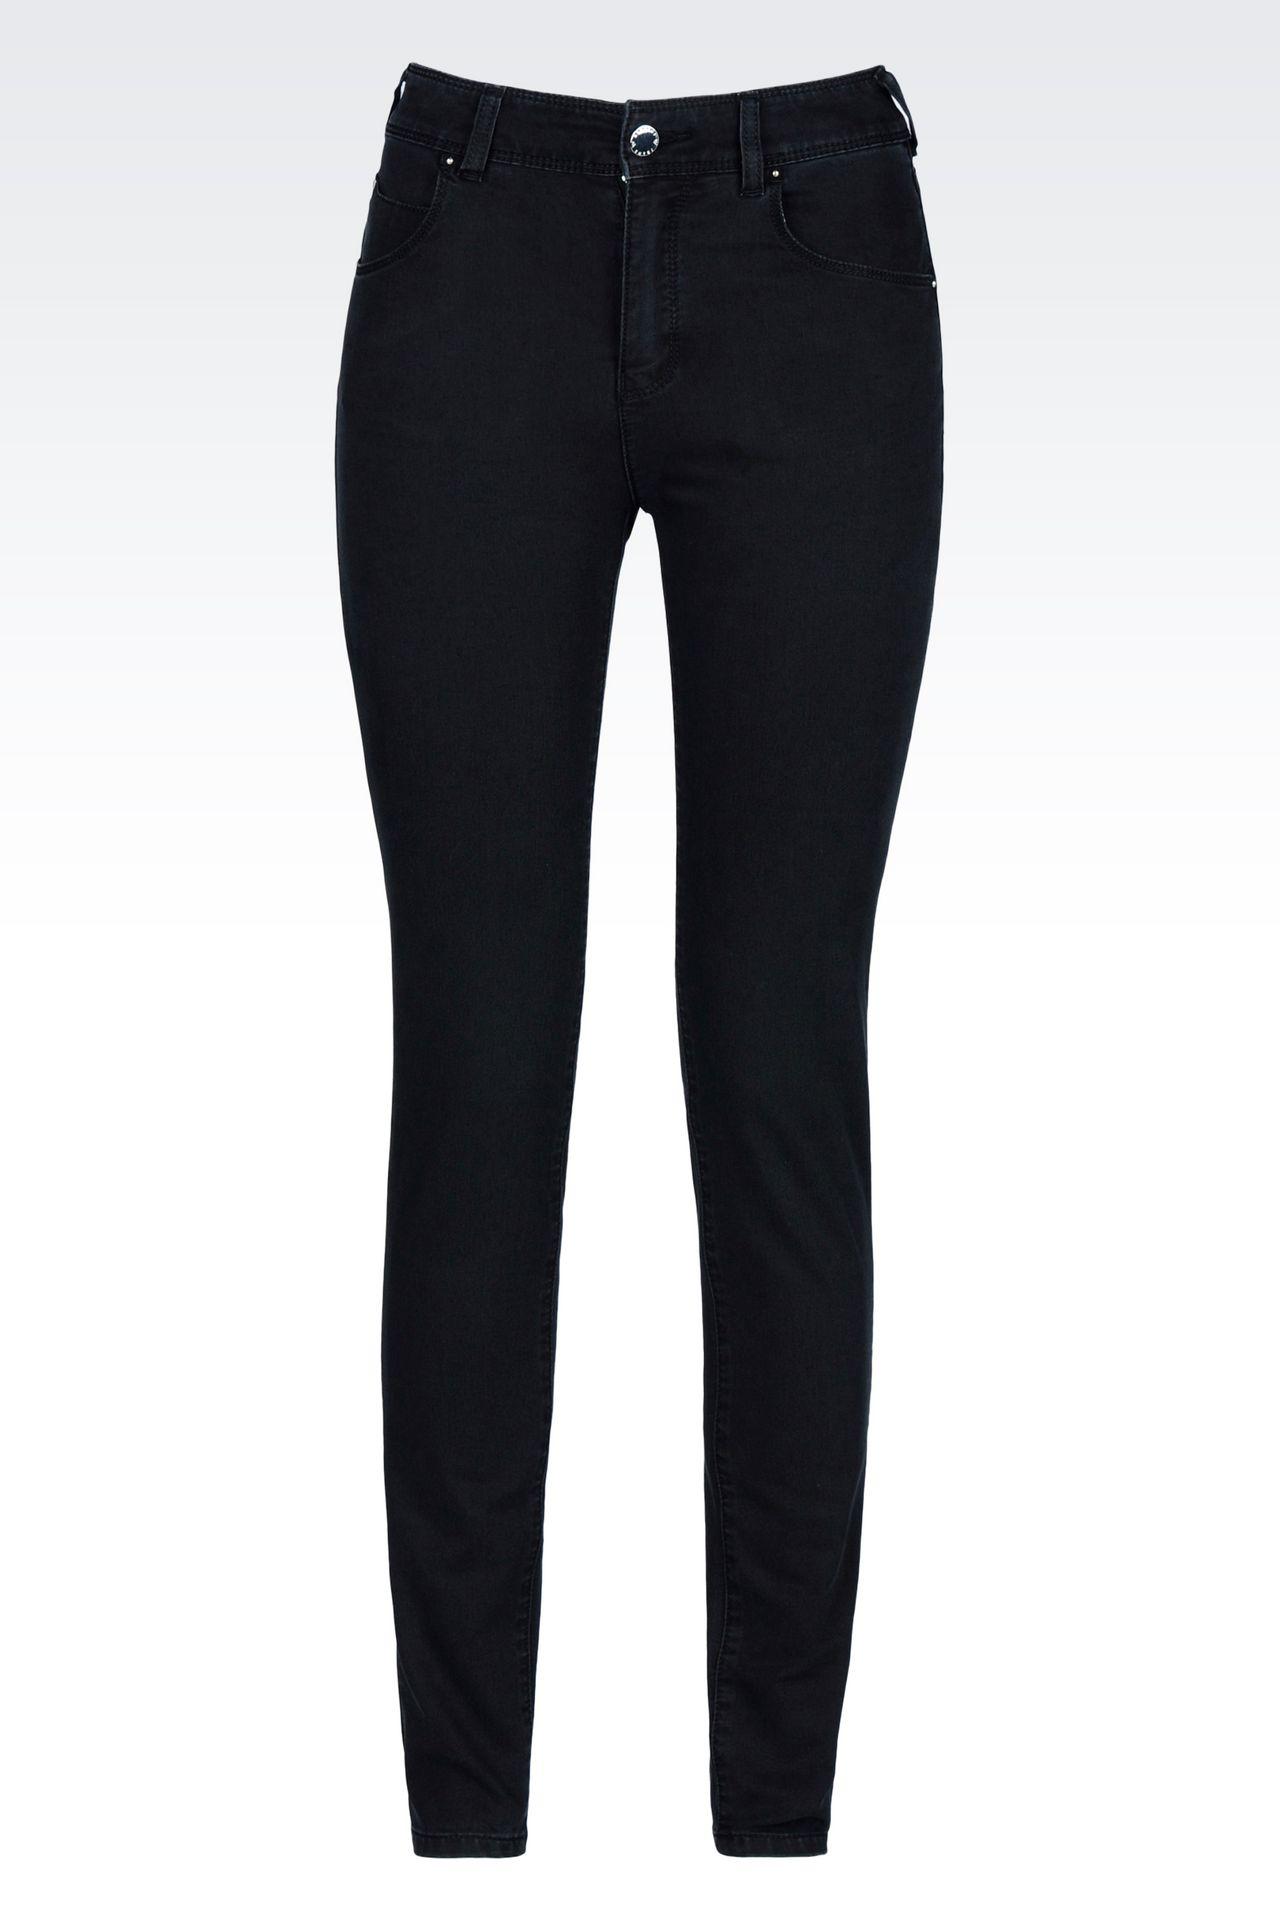 SKINNY DARK WASH JEANS: Jeans Women by Armani - 0